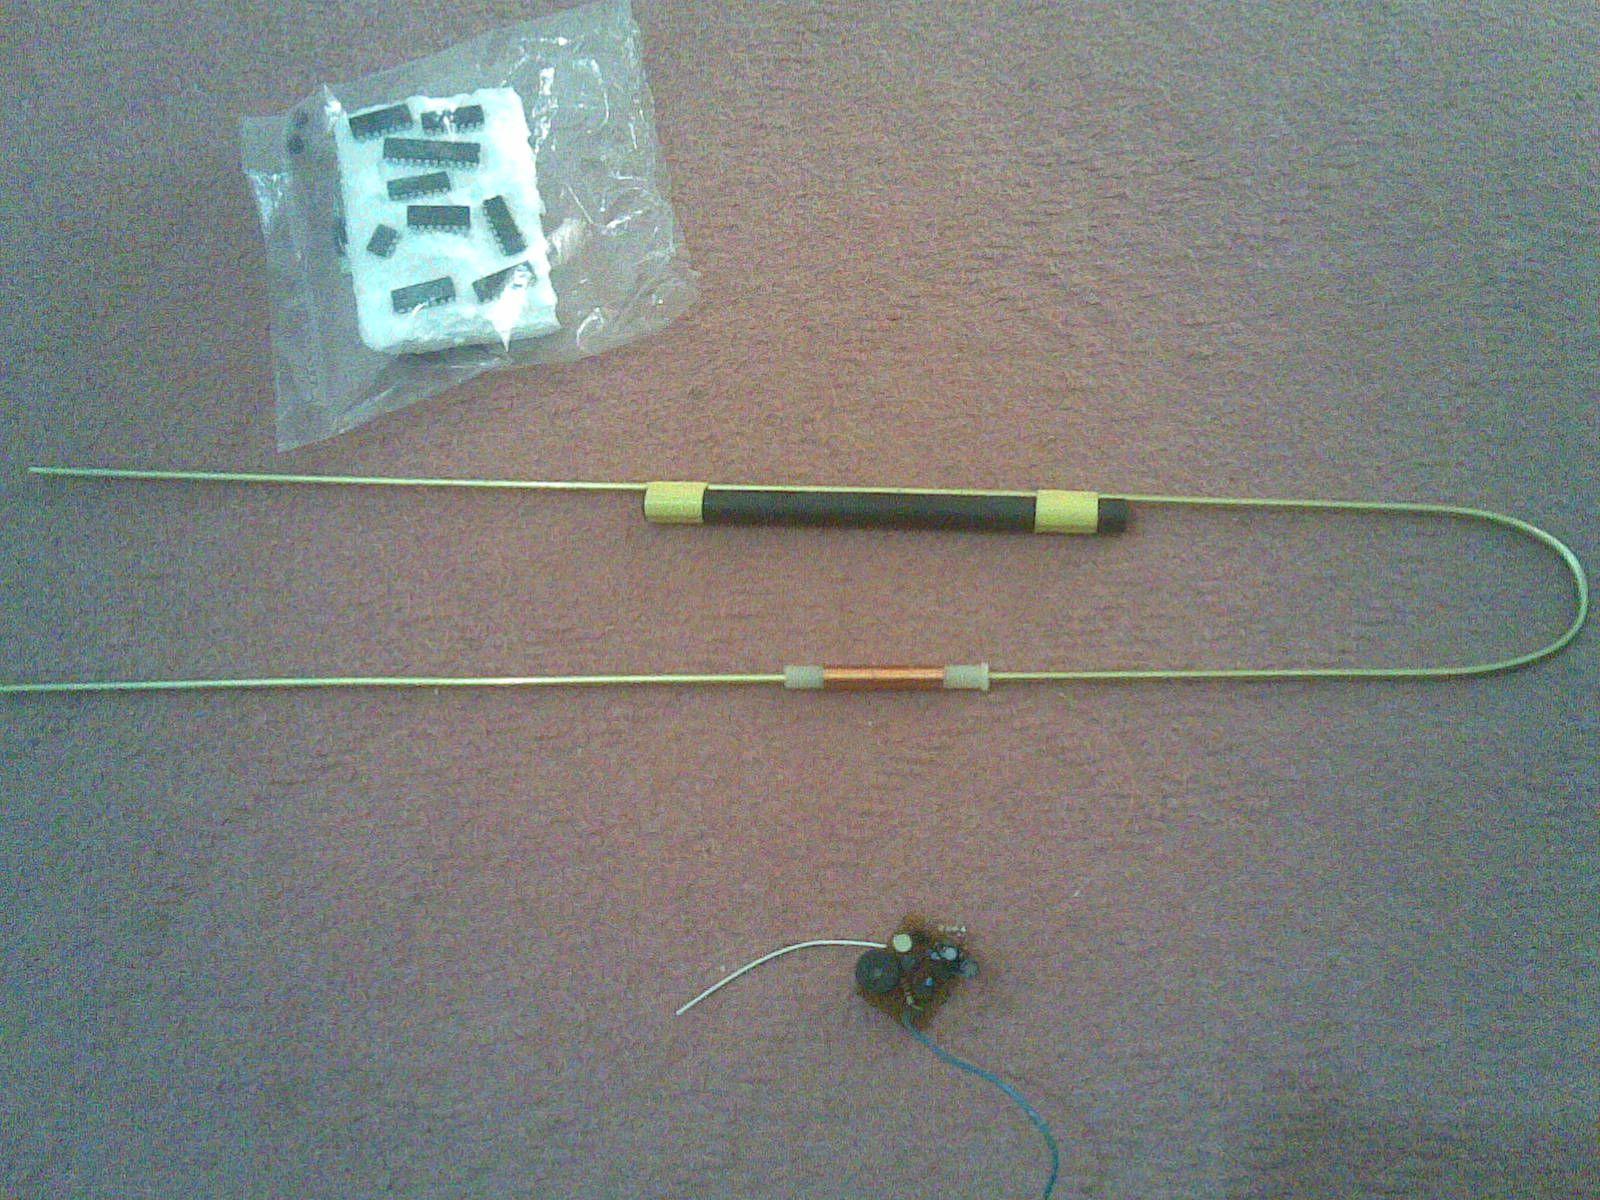 Electronic Dowsing Rod Page 5 Longrangelocators Forums Dowsing Metal Detector Used Metal Detectors